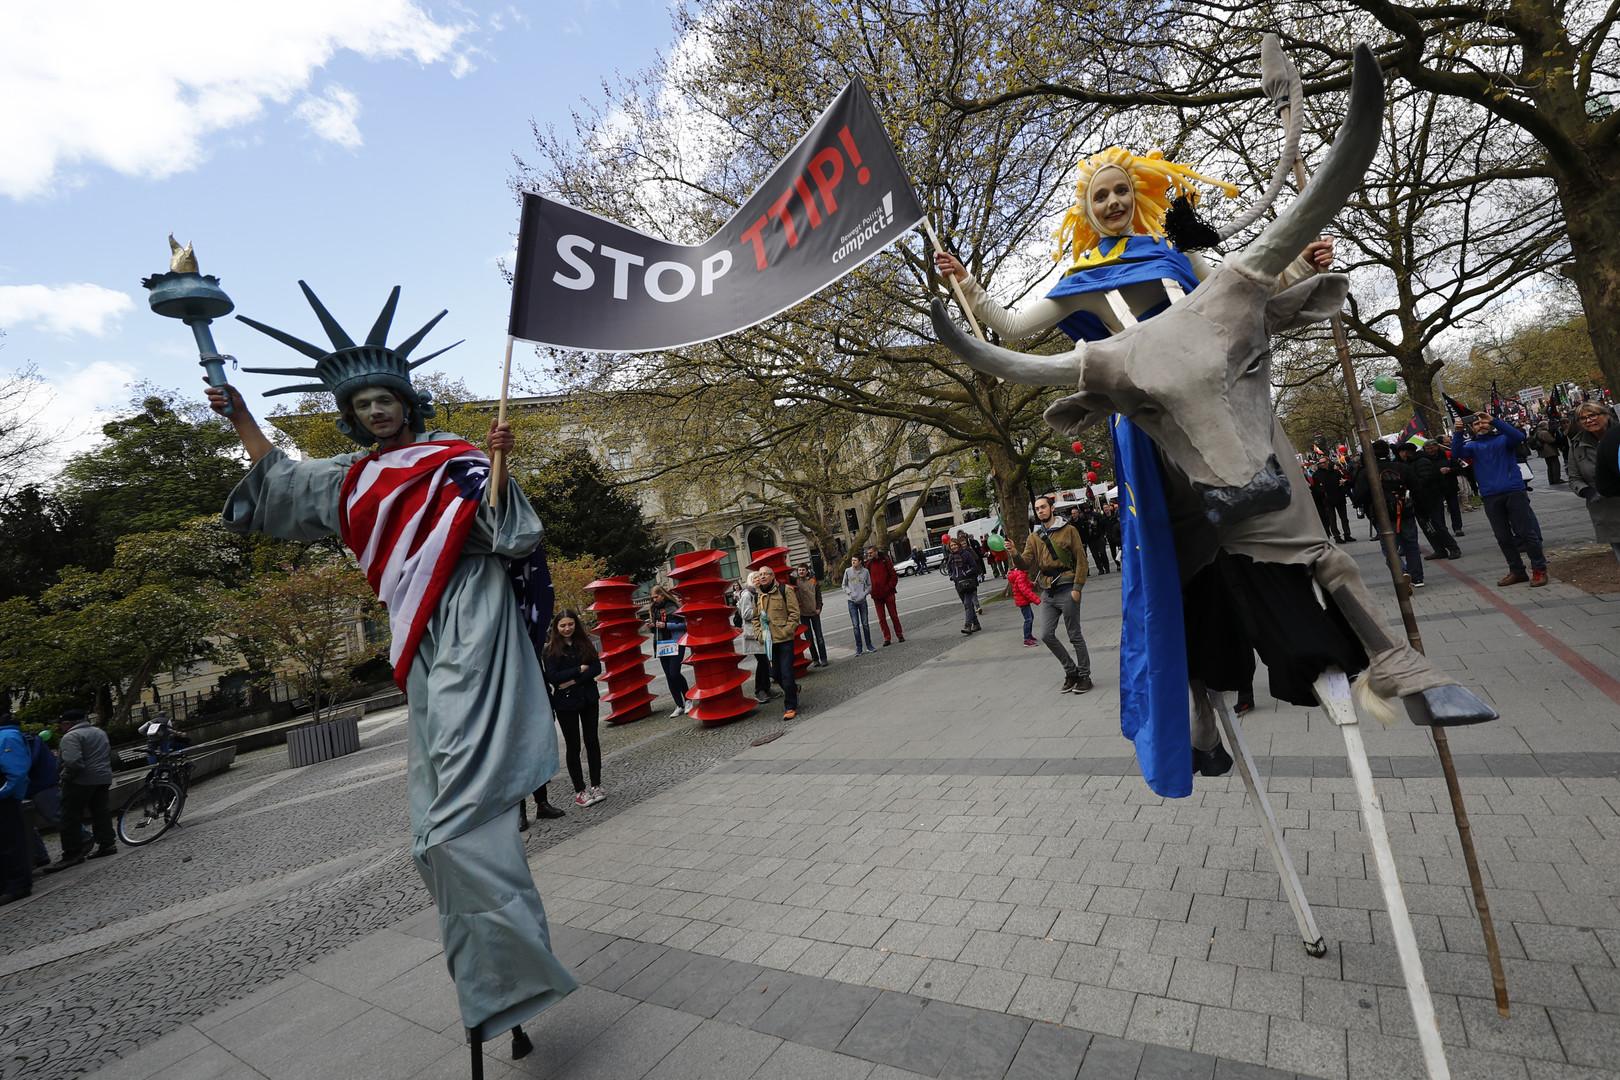 Proteste gegen Freihandel in Hannover: TTIP und CETA stoppen